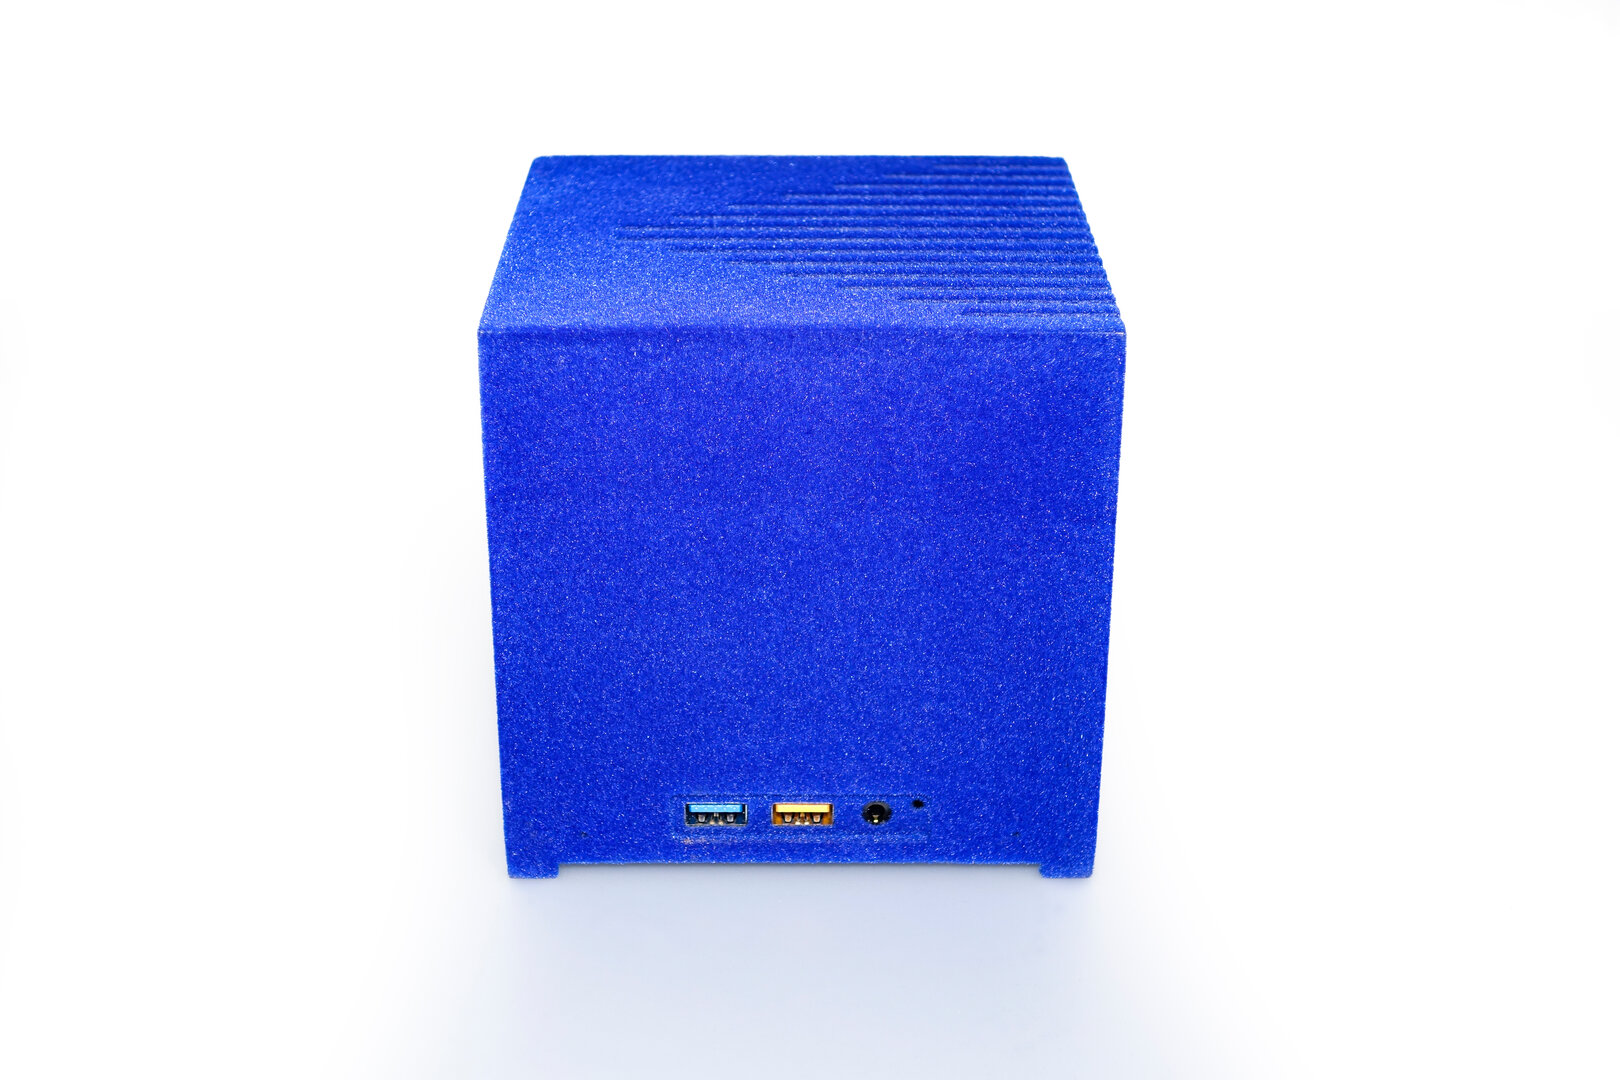 Bleujour Kubb Passiv Edition